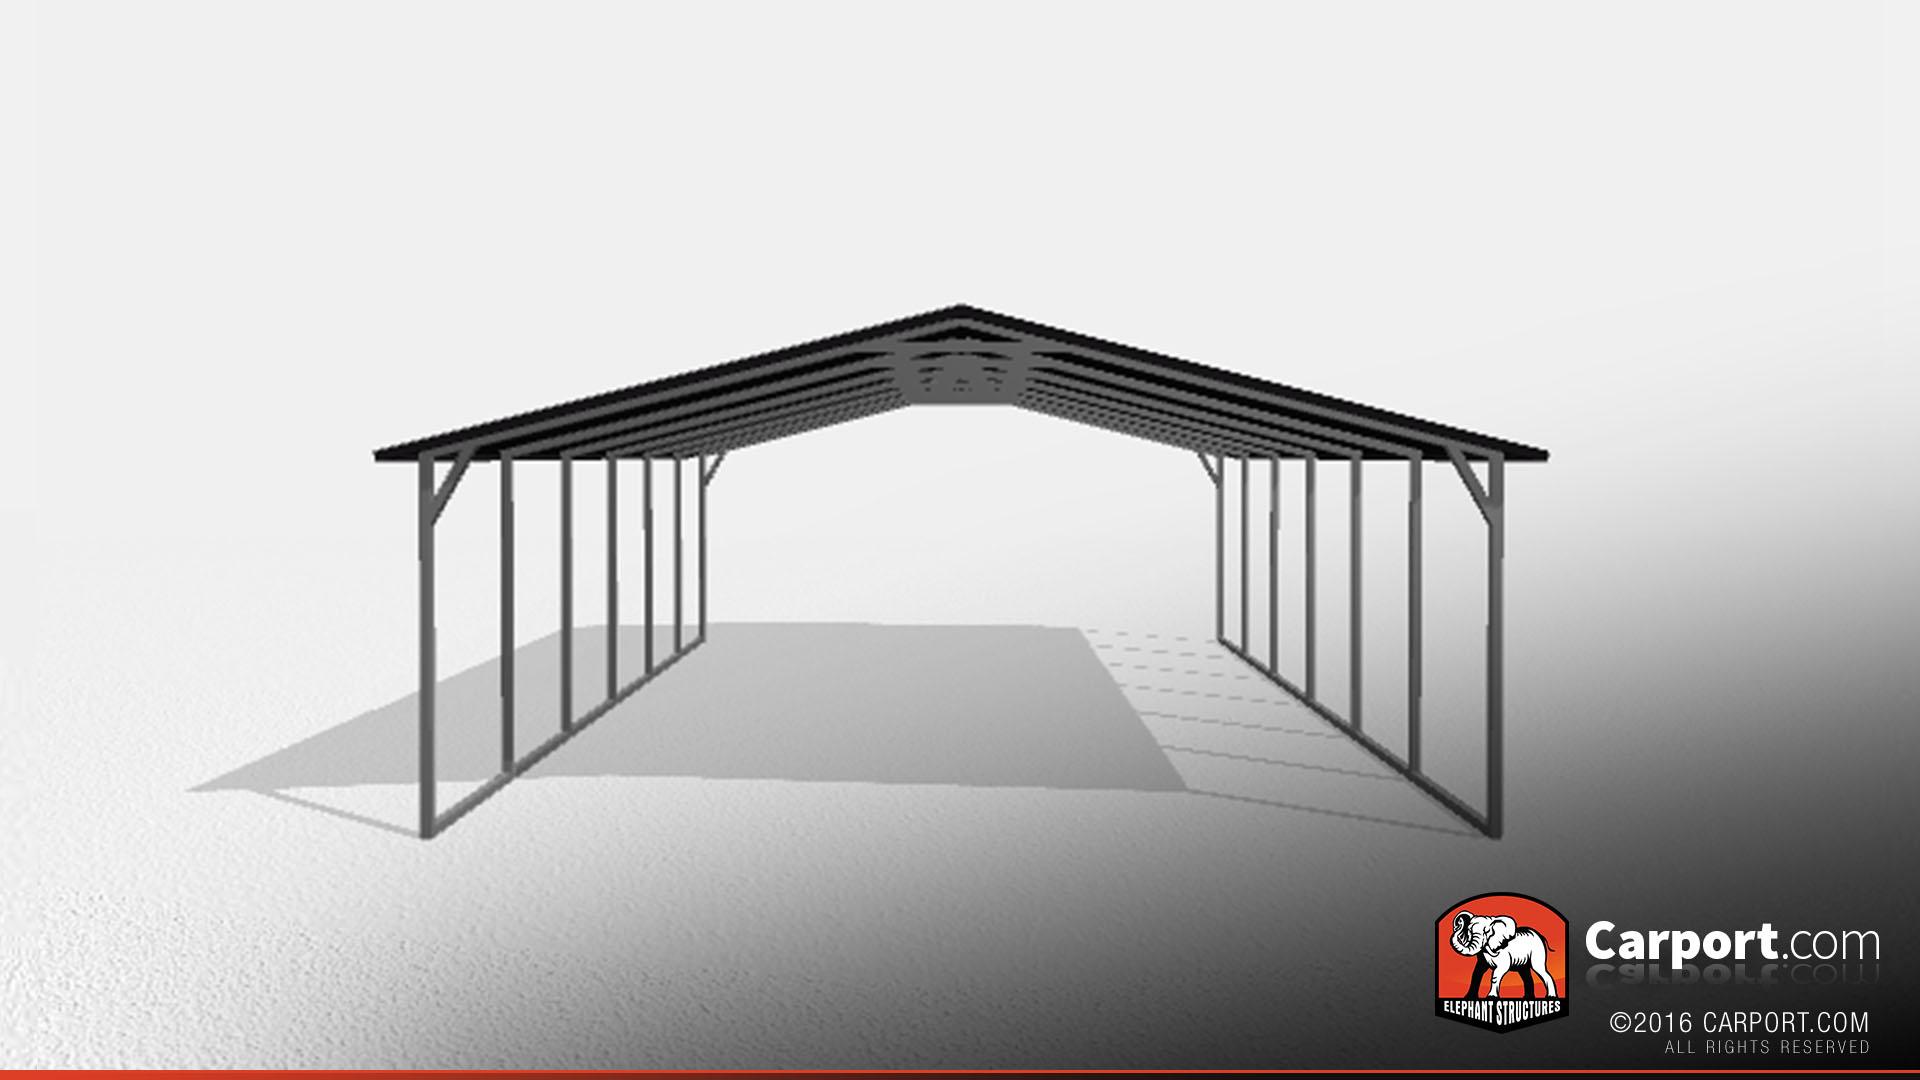 double wide steel carport 20 39 x 26 39 x 7 39 shop steel carports online. Black Bedroom Furniture Sets. Home Design Ideas